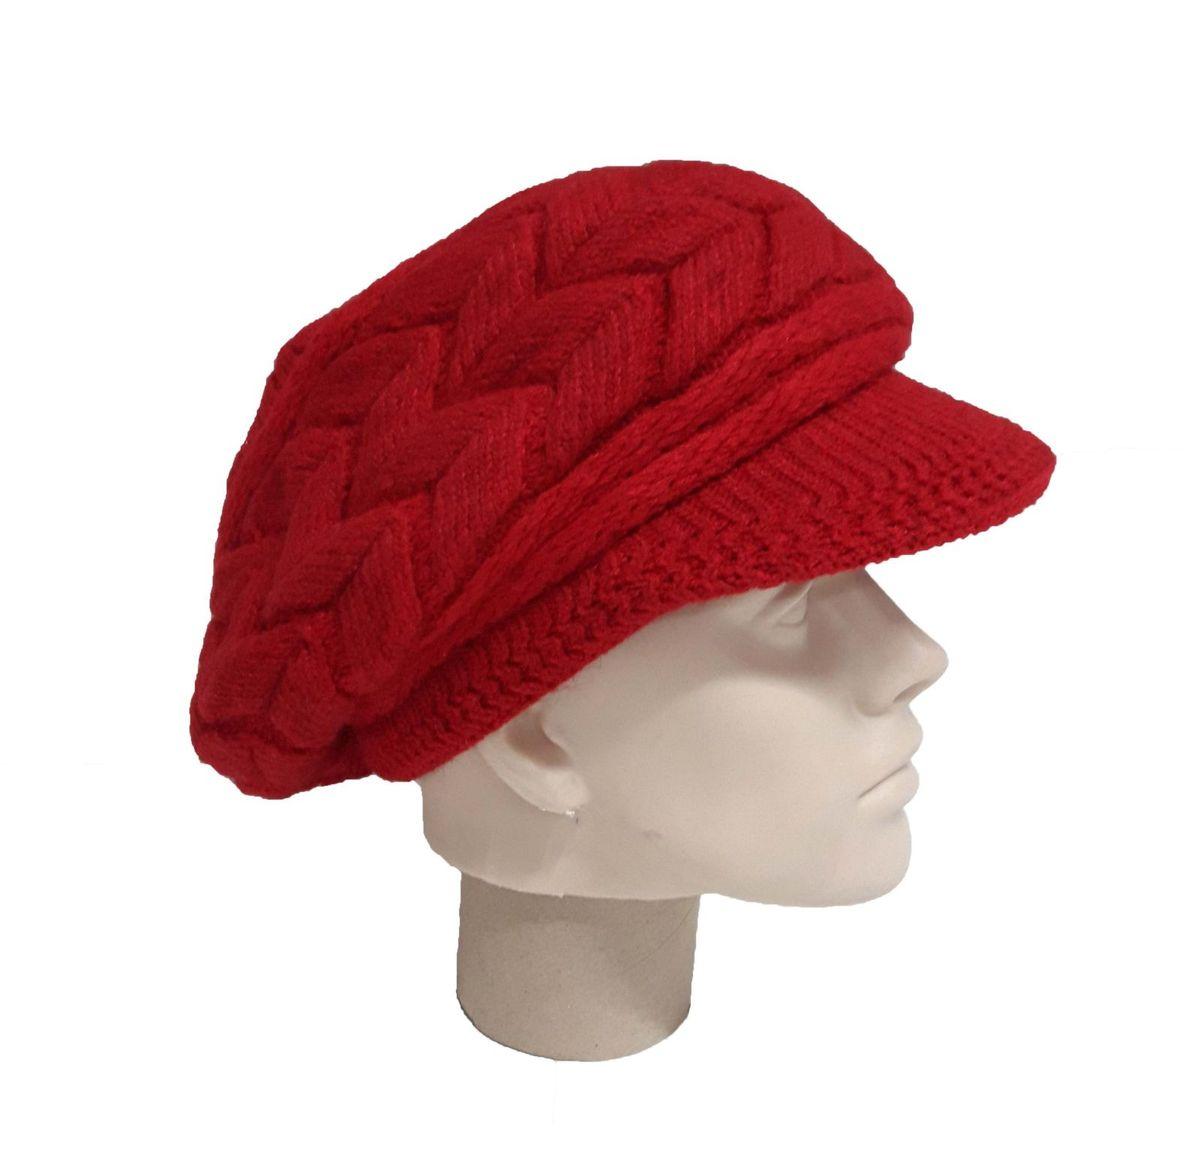 boina gorro lã feminina touca trança tricô aba beanie 48 cm - chapeu  importado 8b709f3ac13